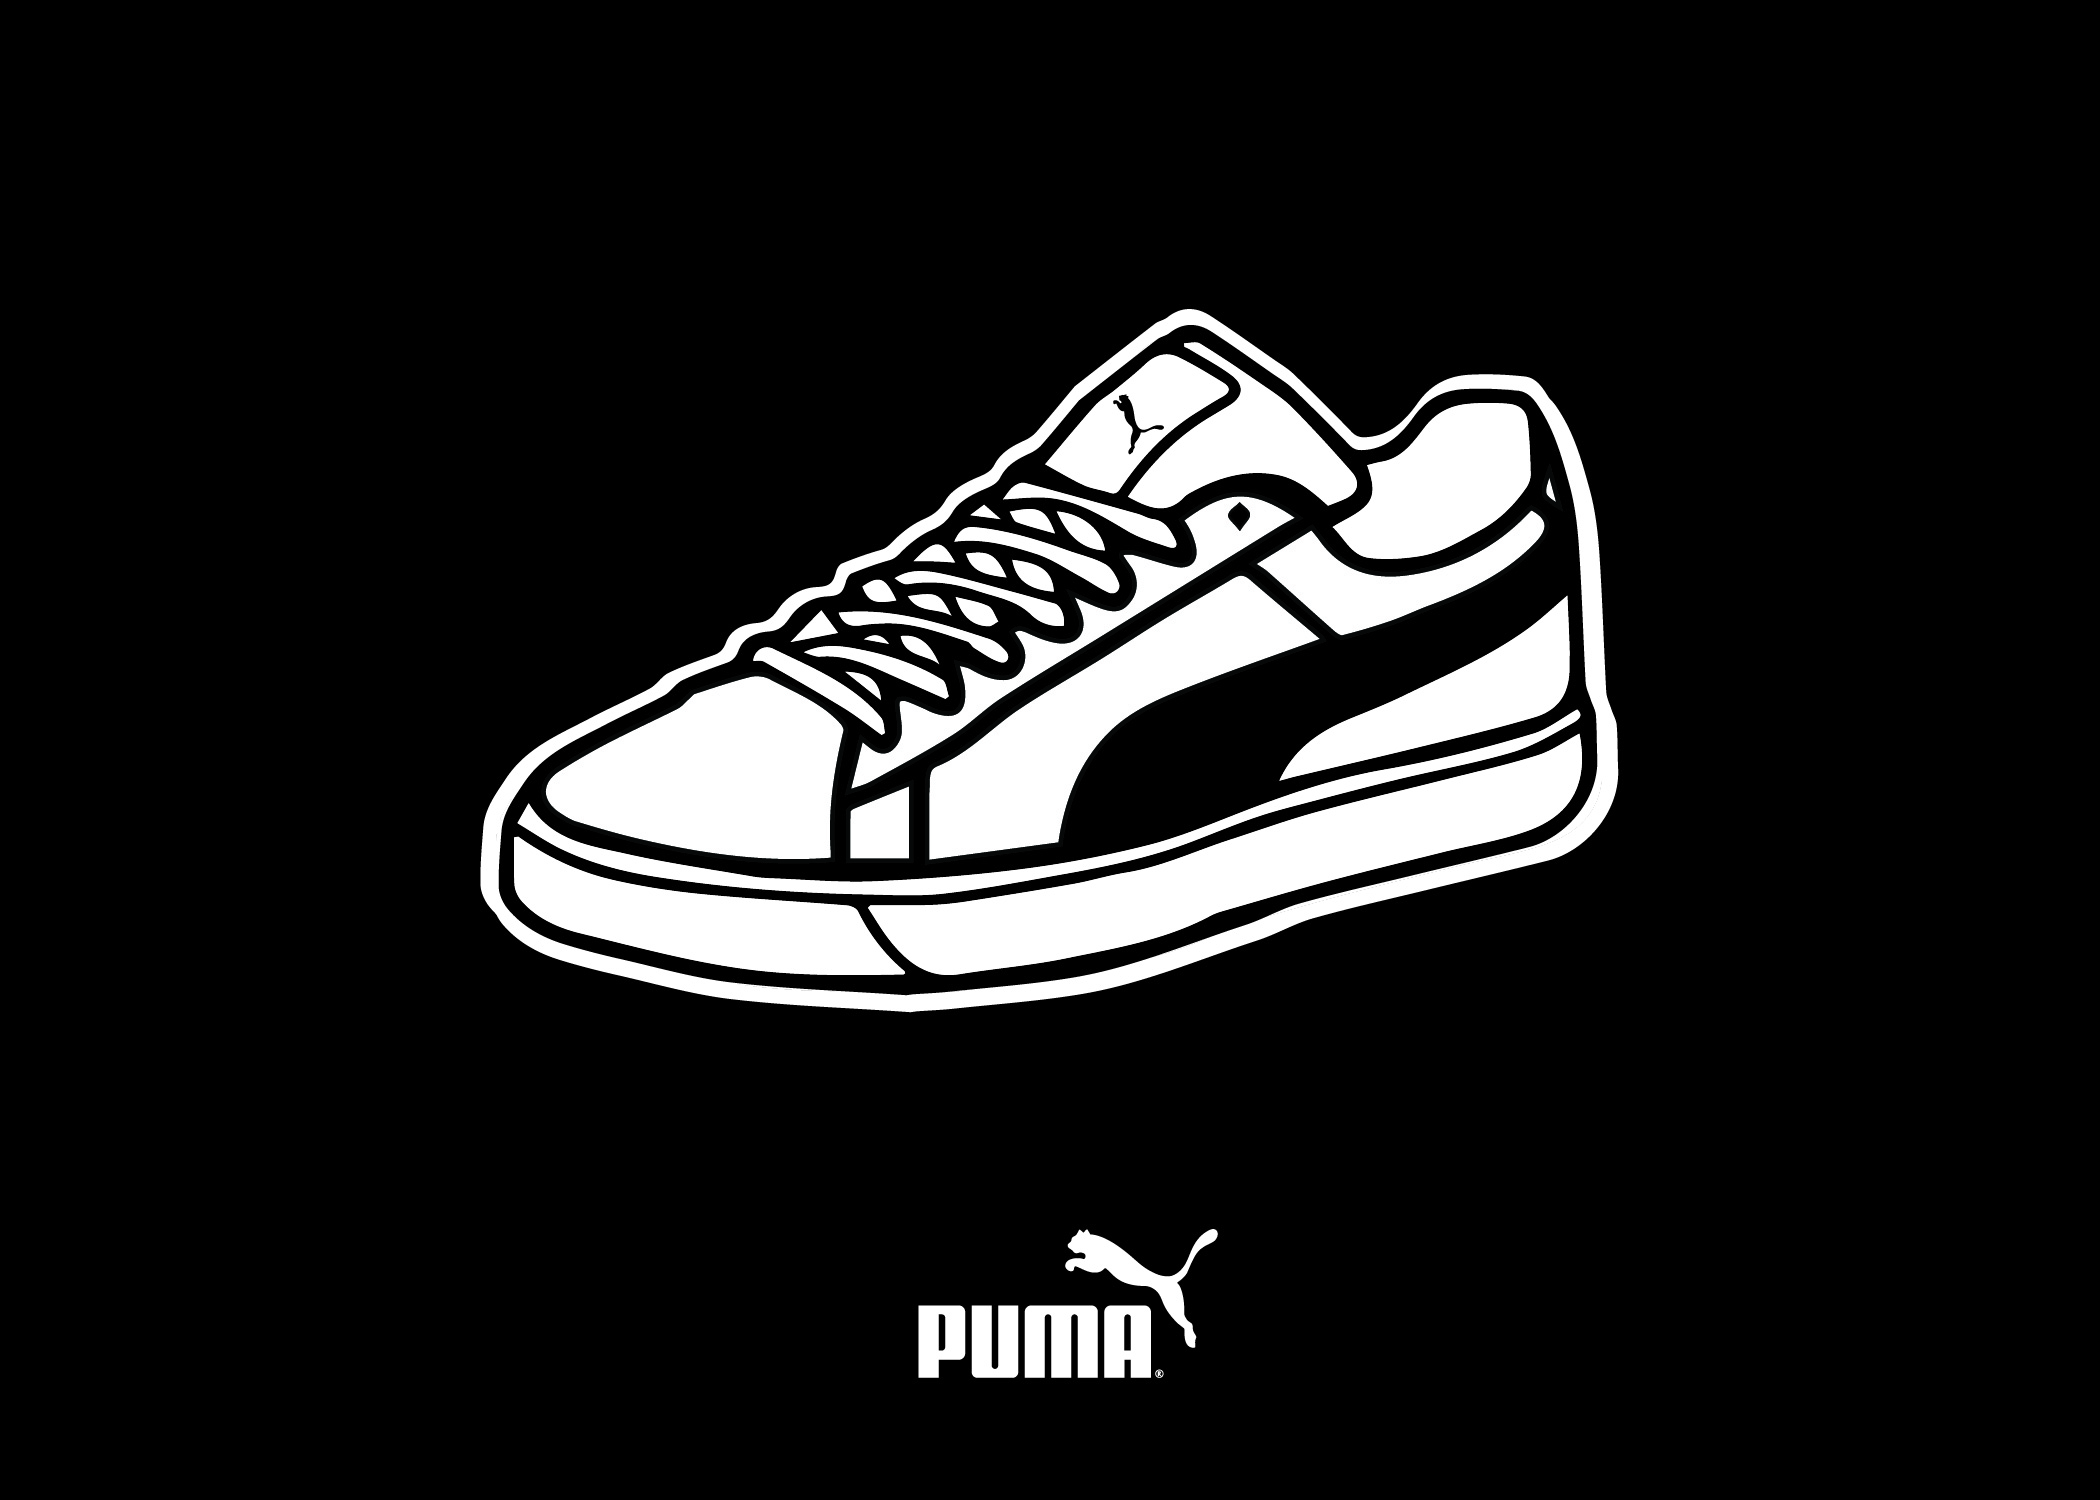 PUMA-1135_No-go_SeedingCards_PR-Social_7x5-05.jpg